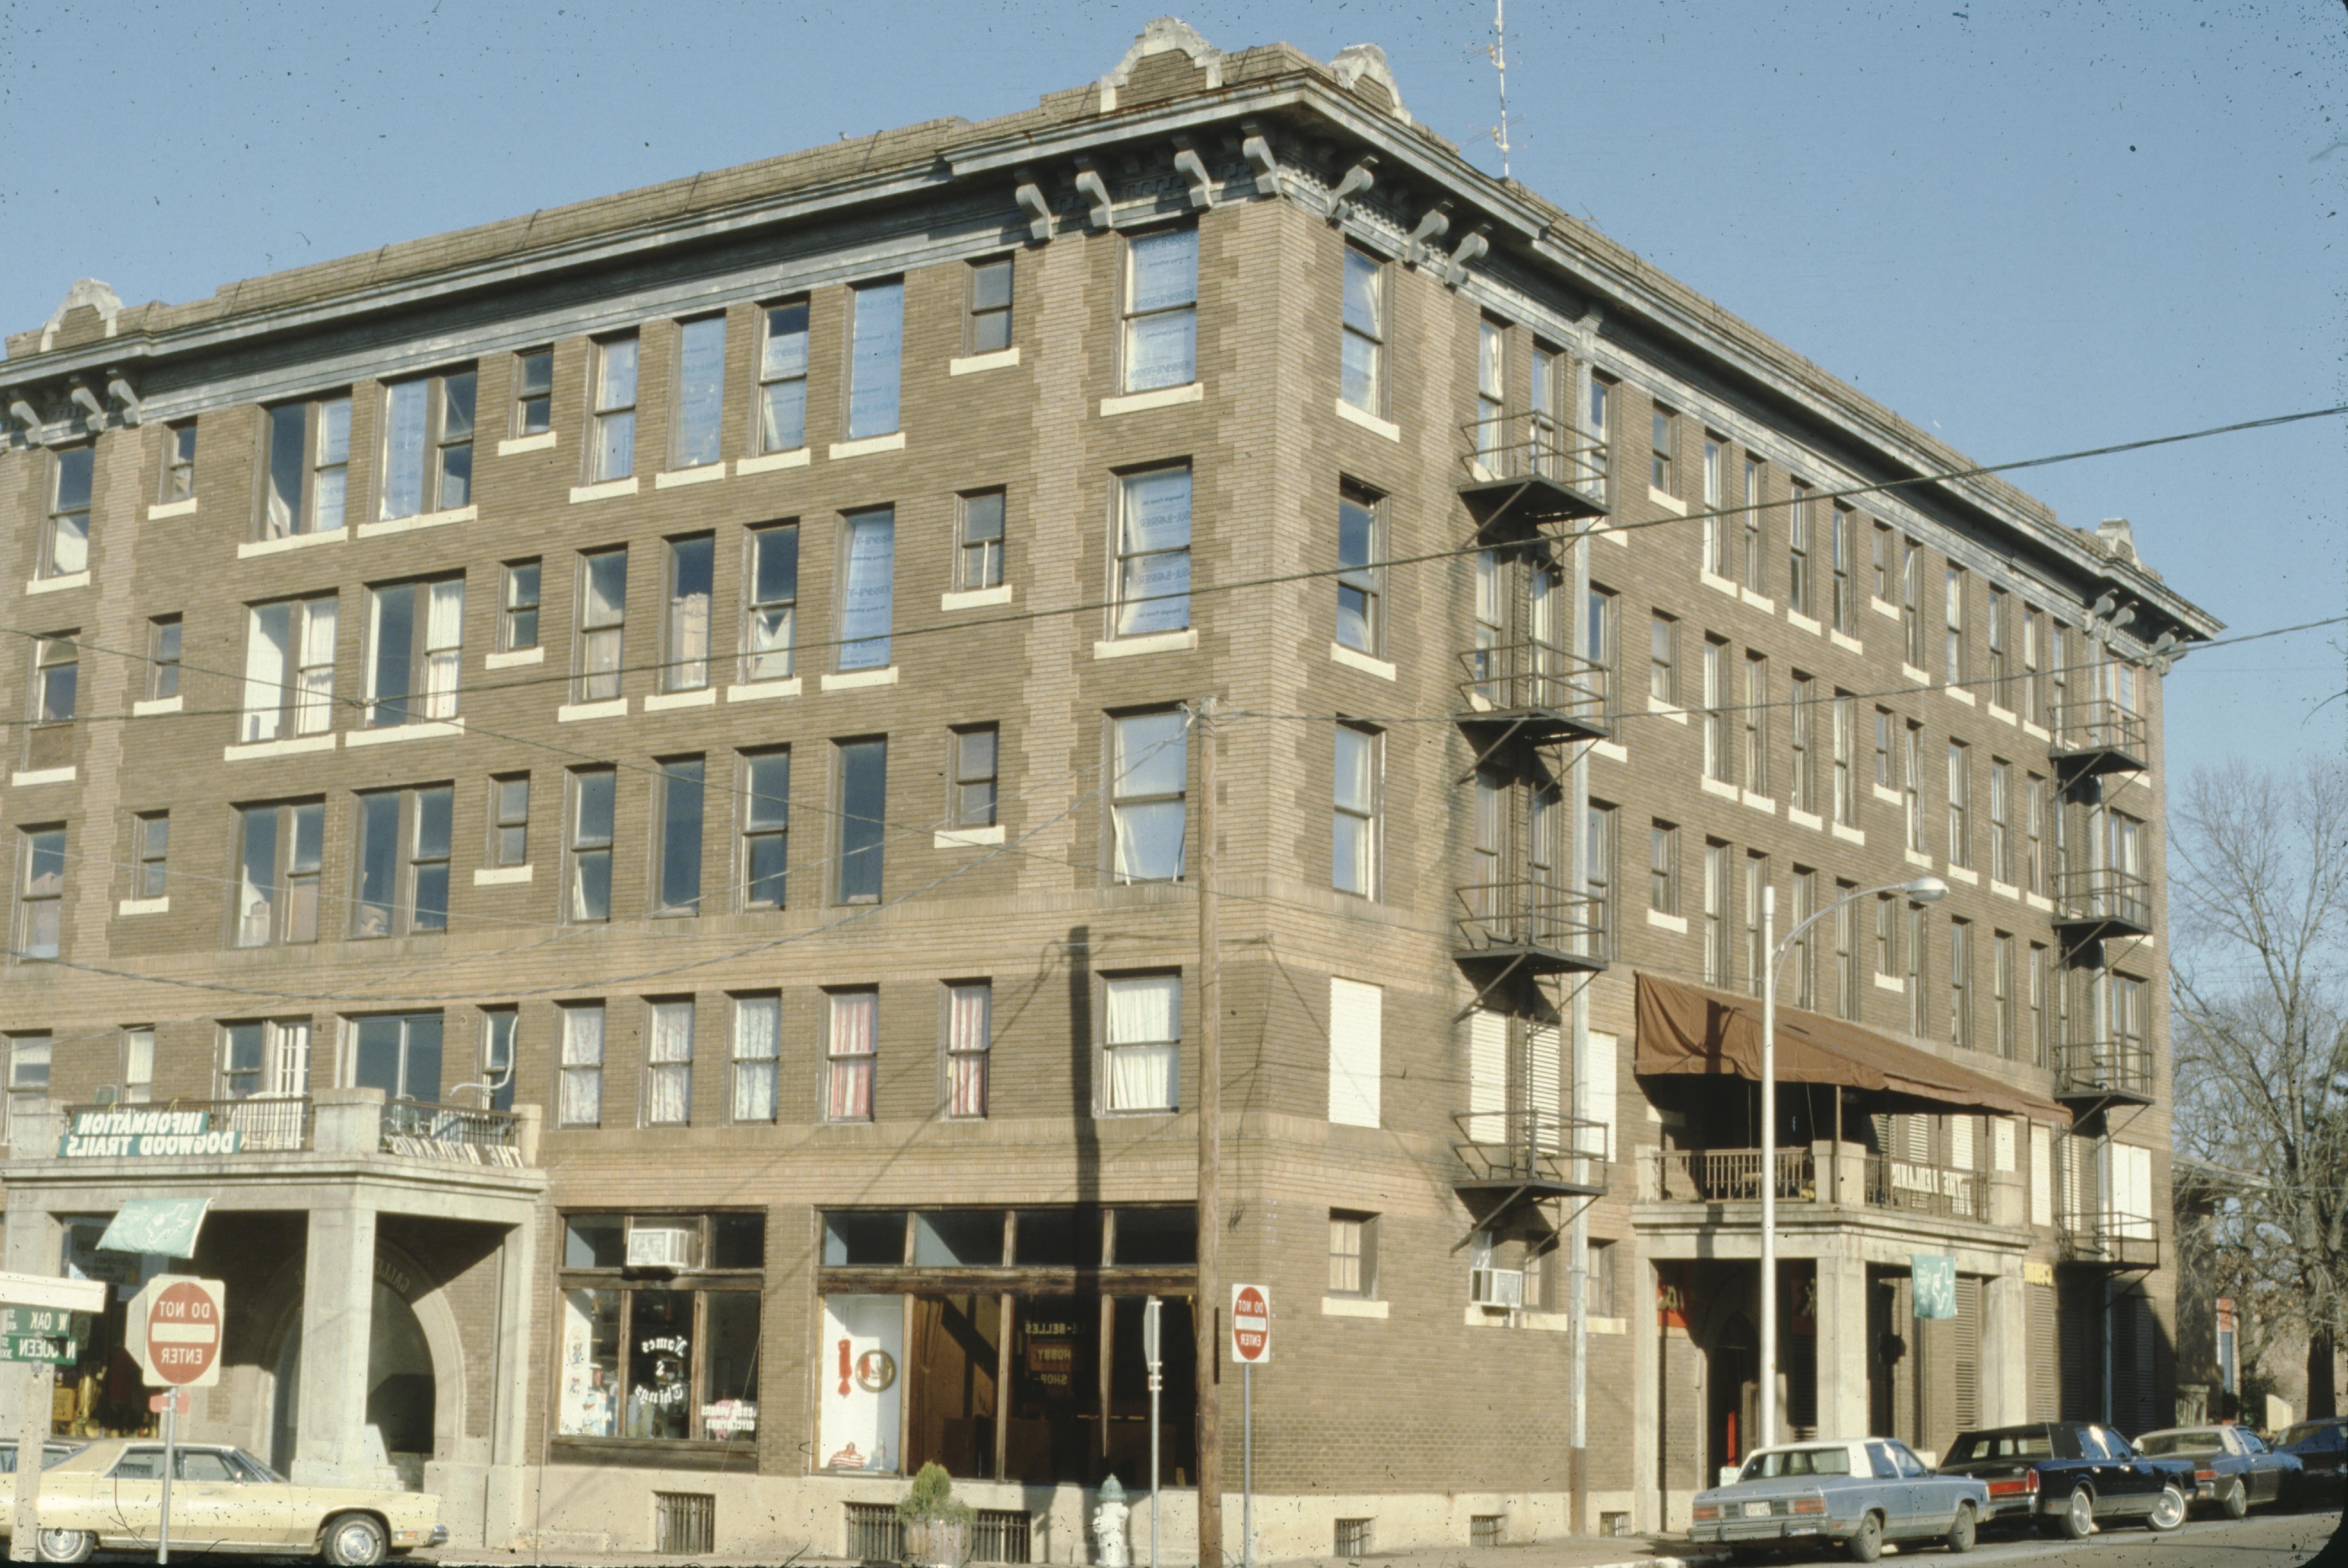 Redland's Building